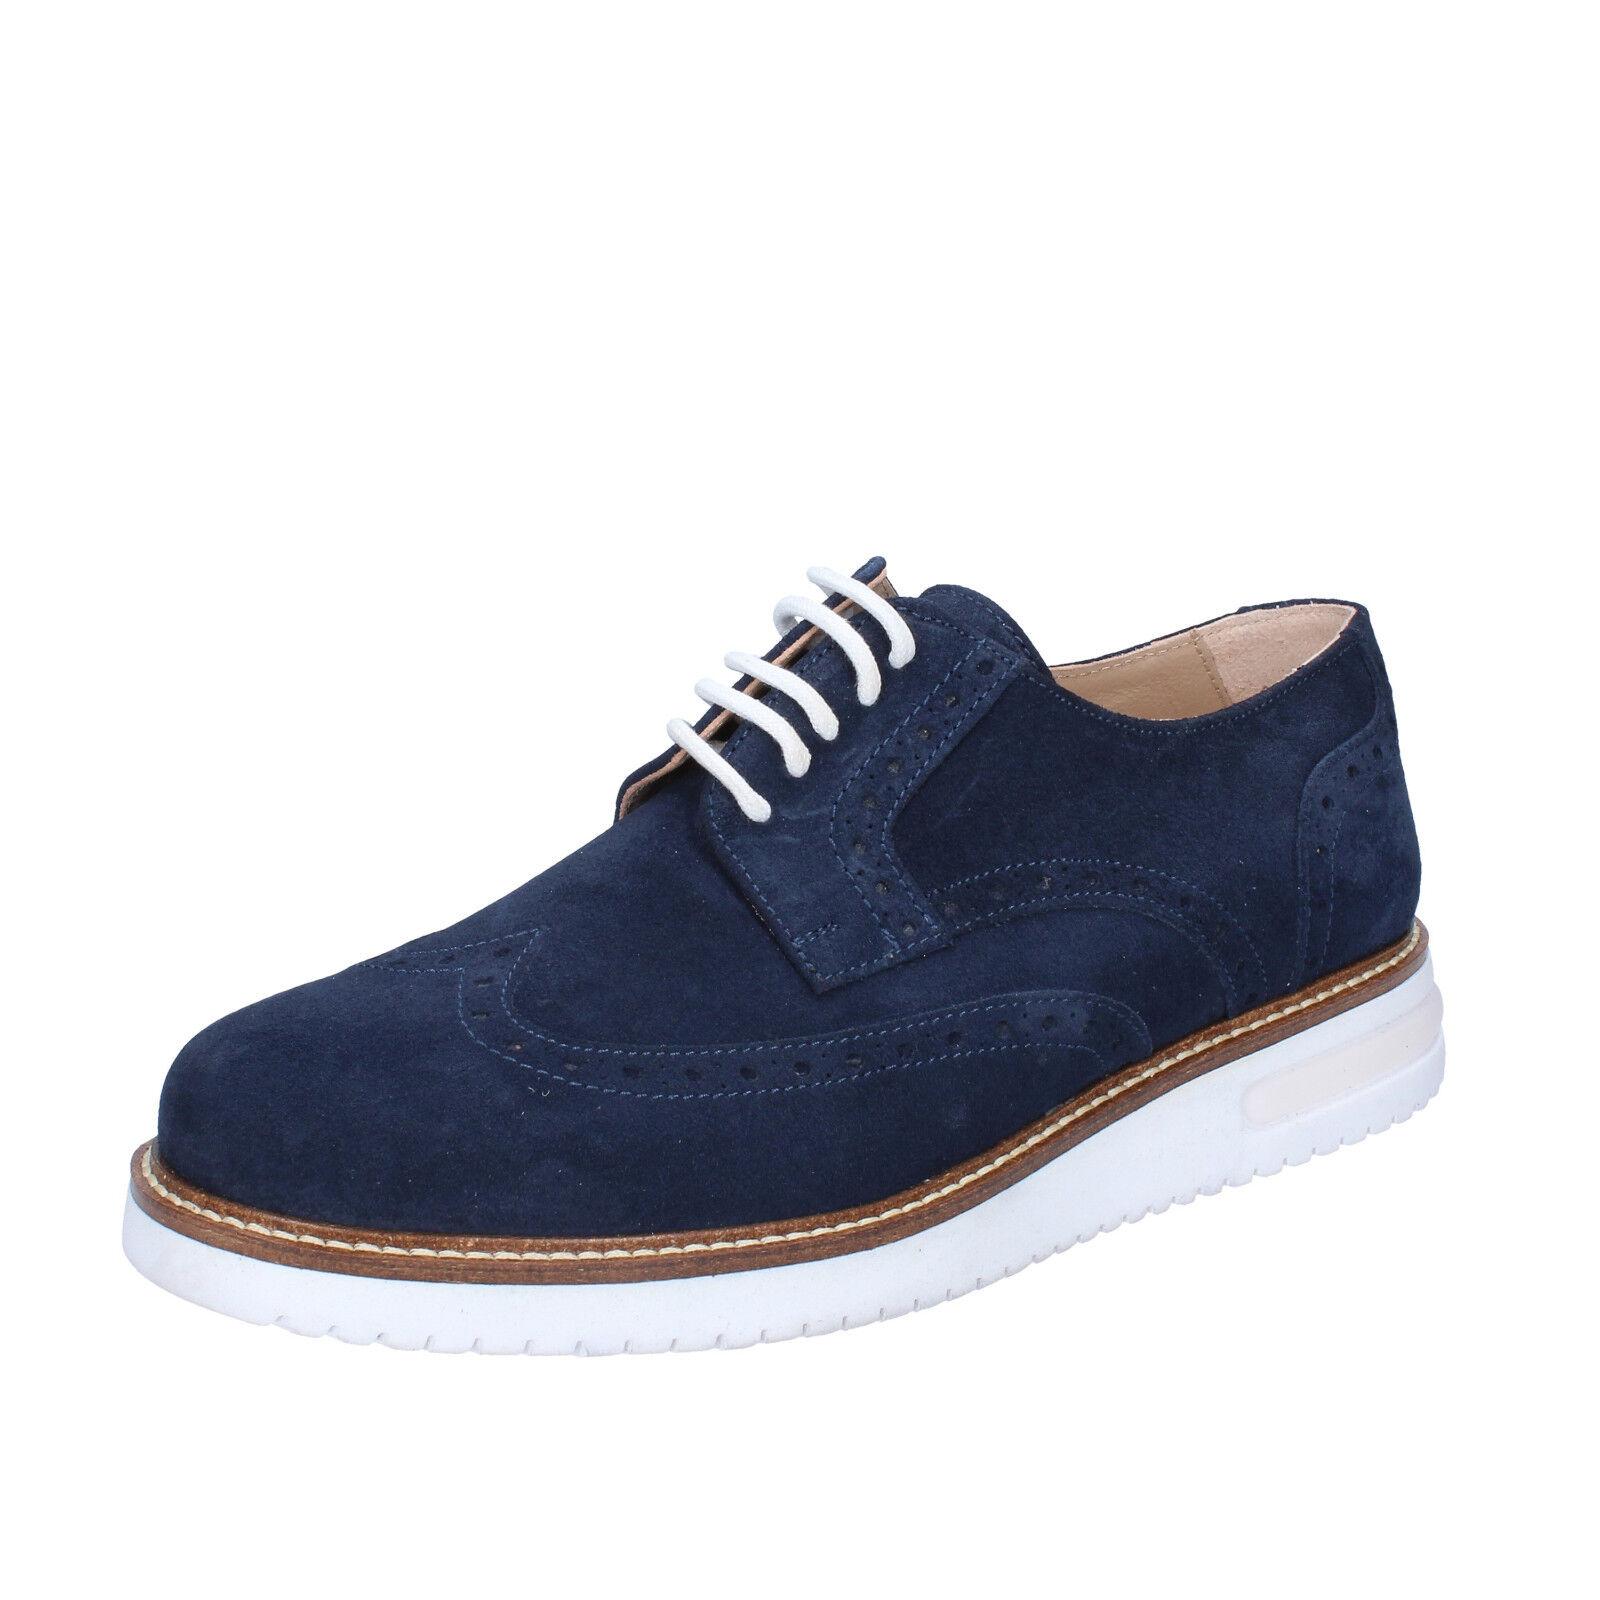 mens shoes elegant FDF SHOES 7 (EU 41) elegant shoes blue suede BZ394-D 74eca5